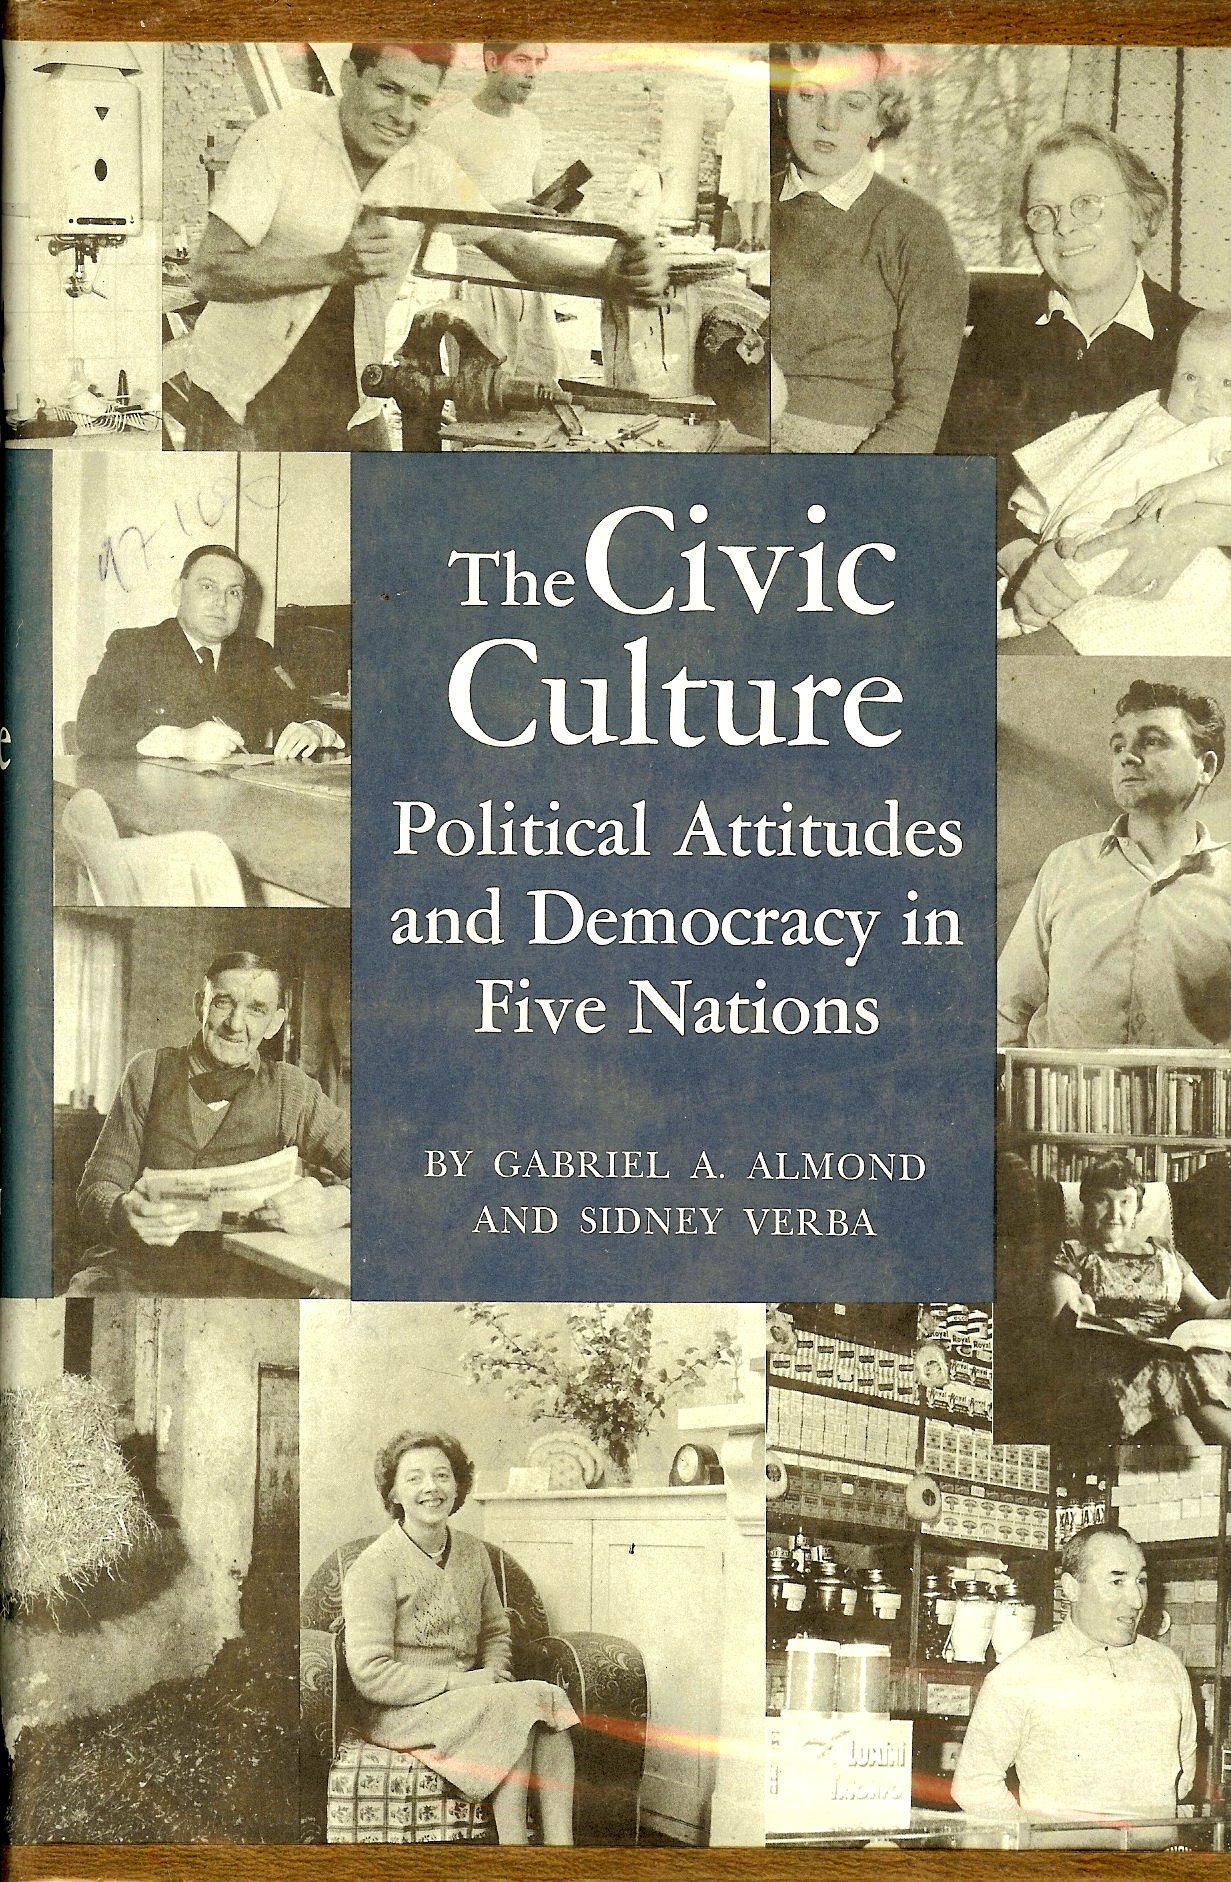 نتيجة بحث الصور عن civic culture almond and verba